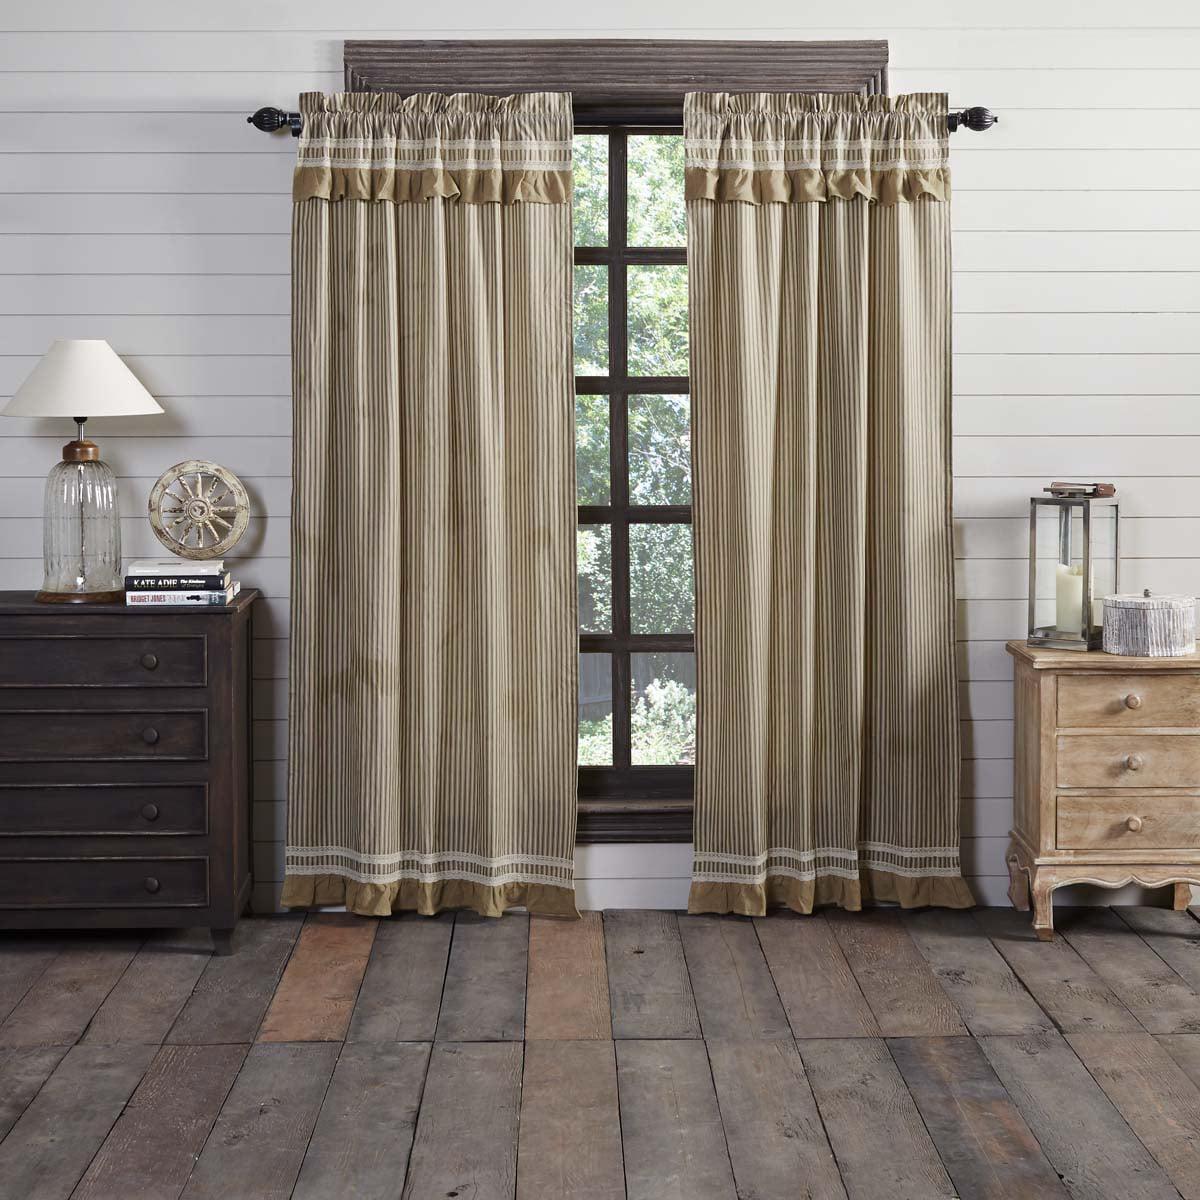 Cotton Canvas Black Eyelet Lined Curtain: Creme Black White Farmhouse Curtains Kendra Stripe Rod